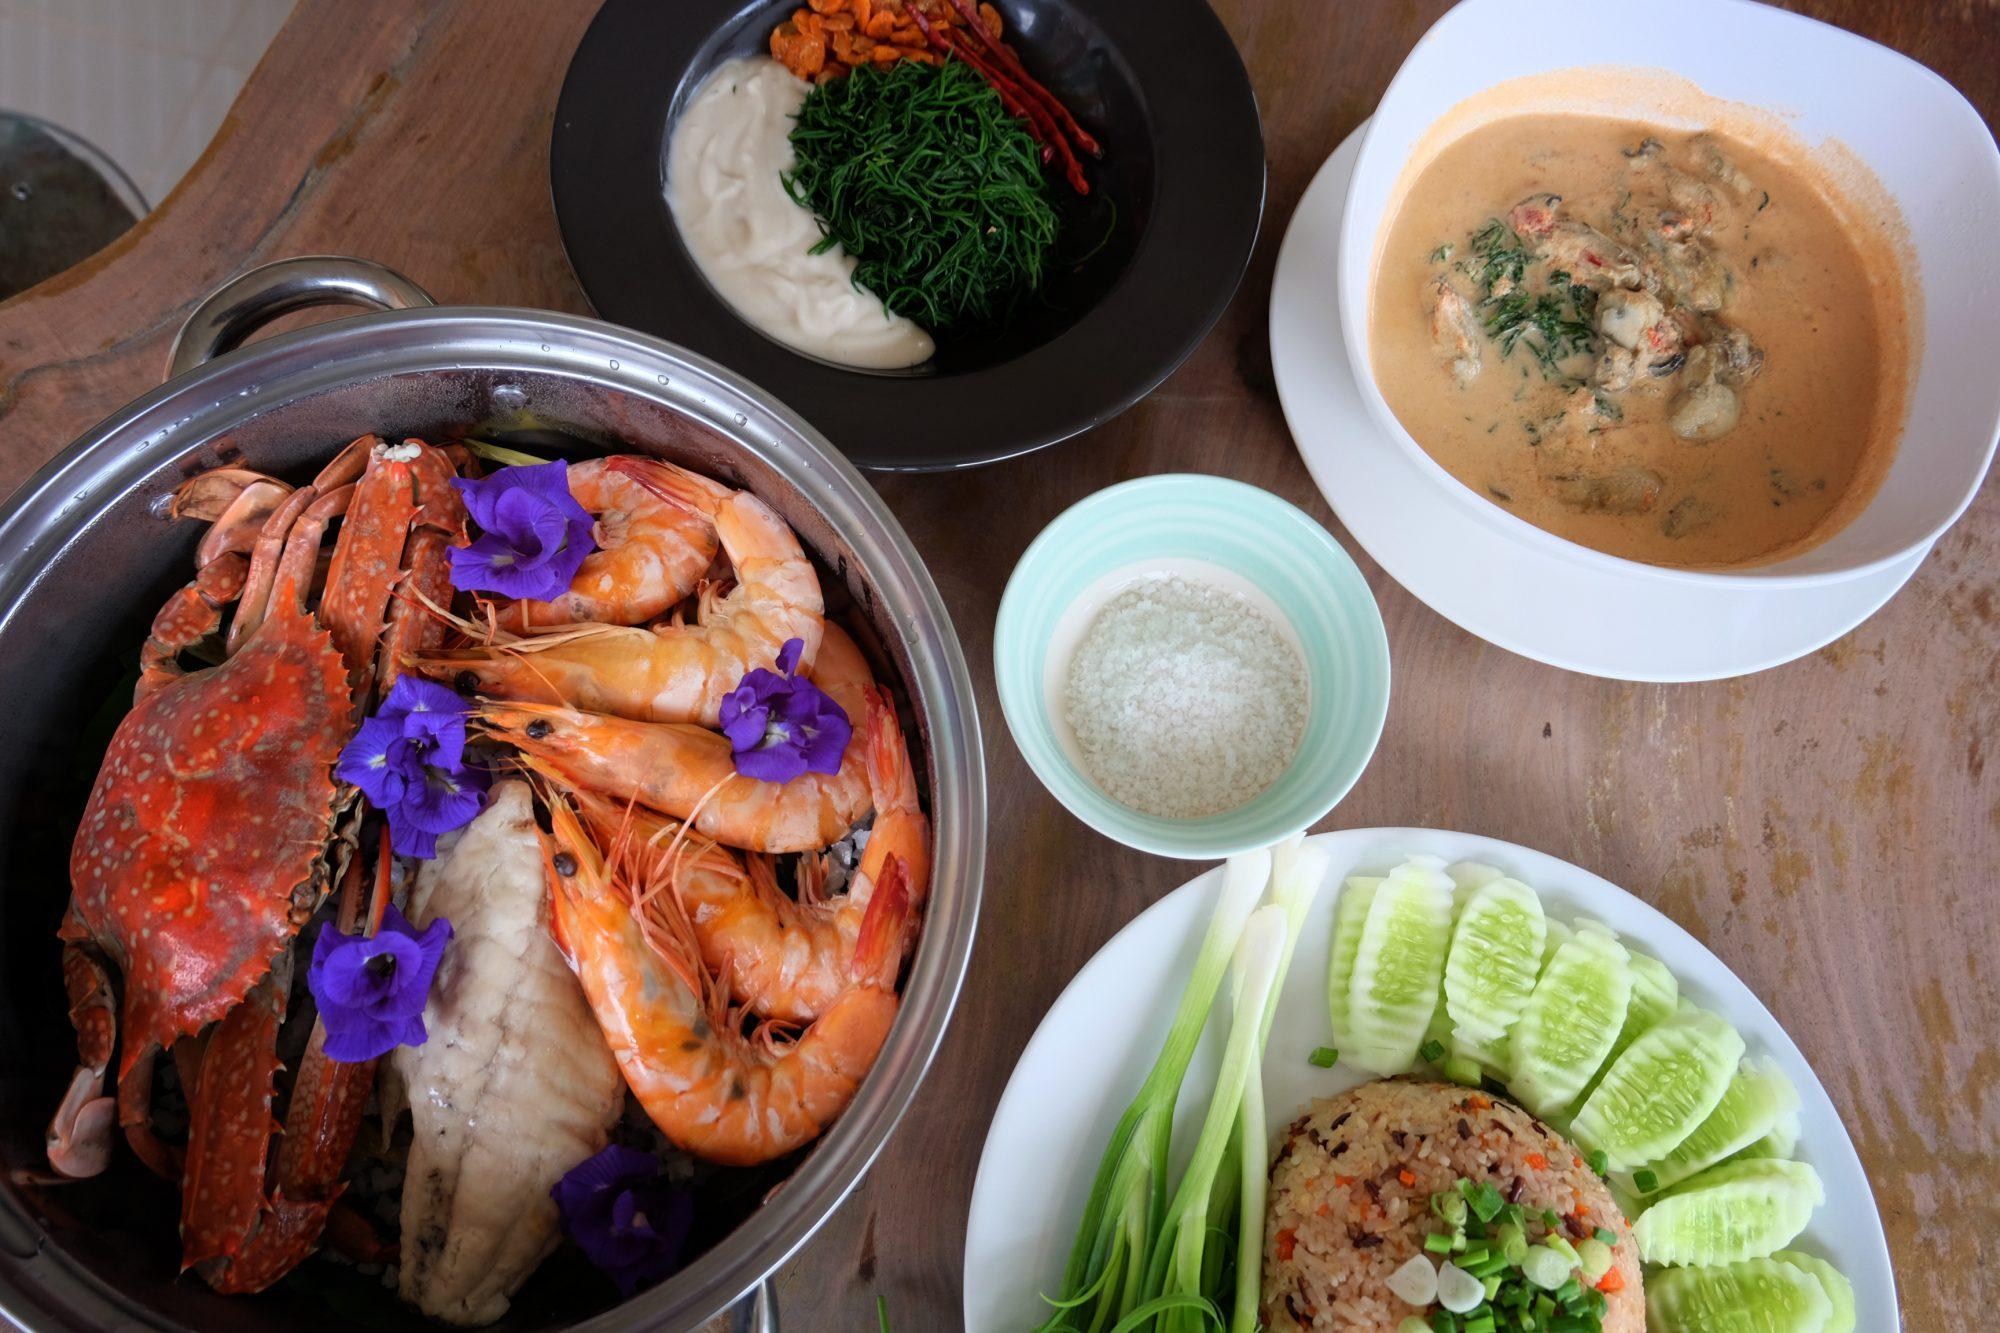 Samut Sakhon – Mangroves, Salt Farms, and Seafood!